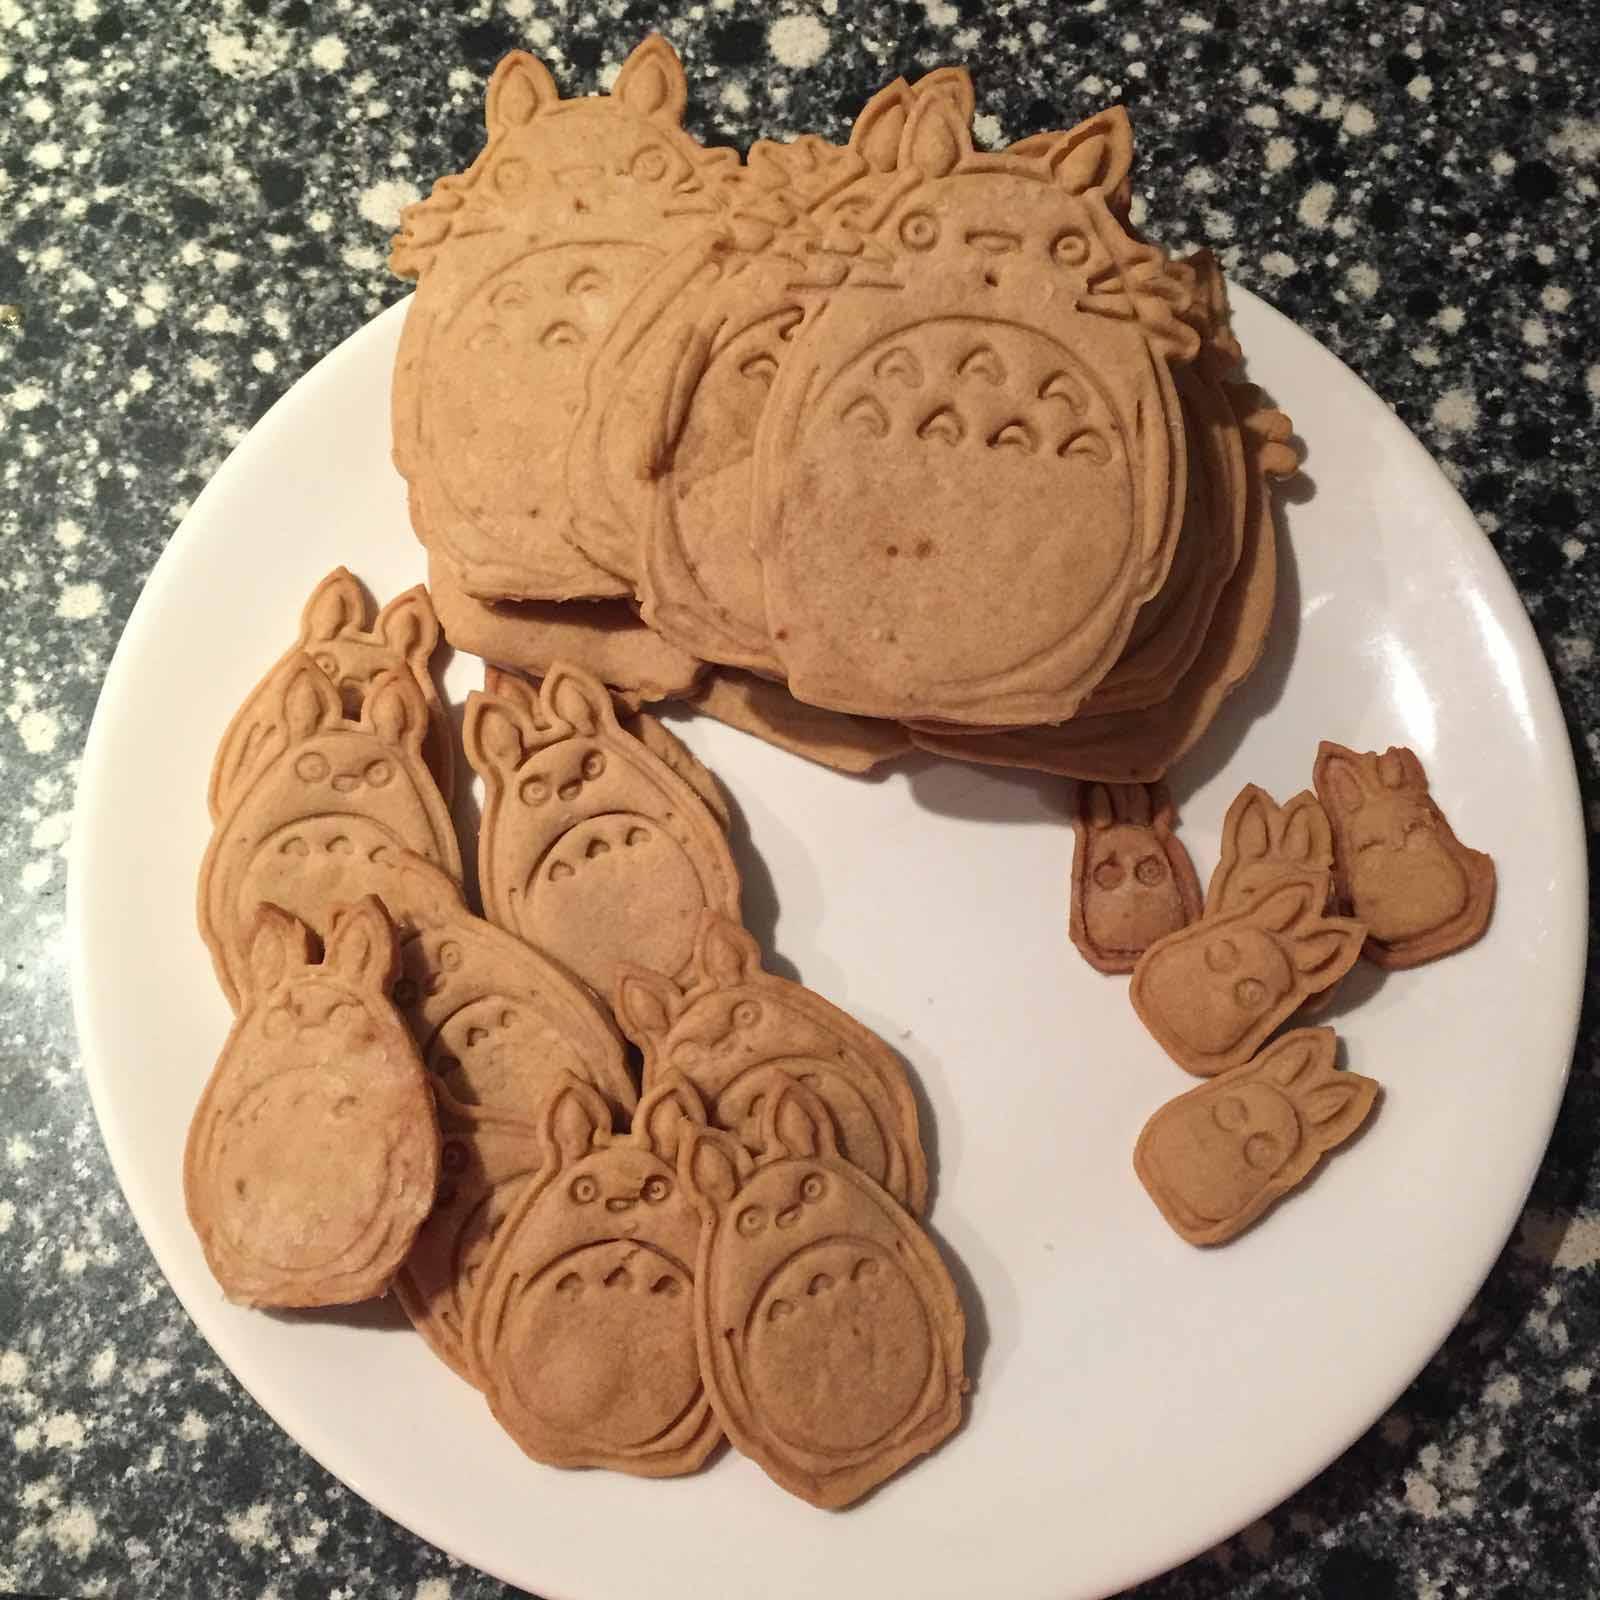 Neighbor Totoro zandkoekjes